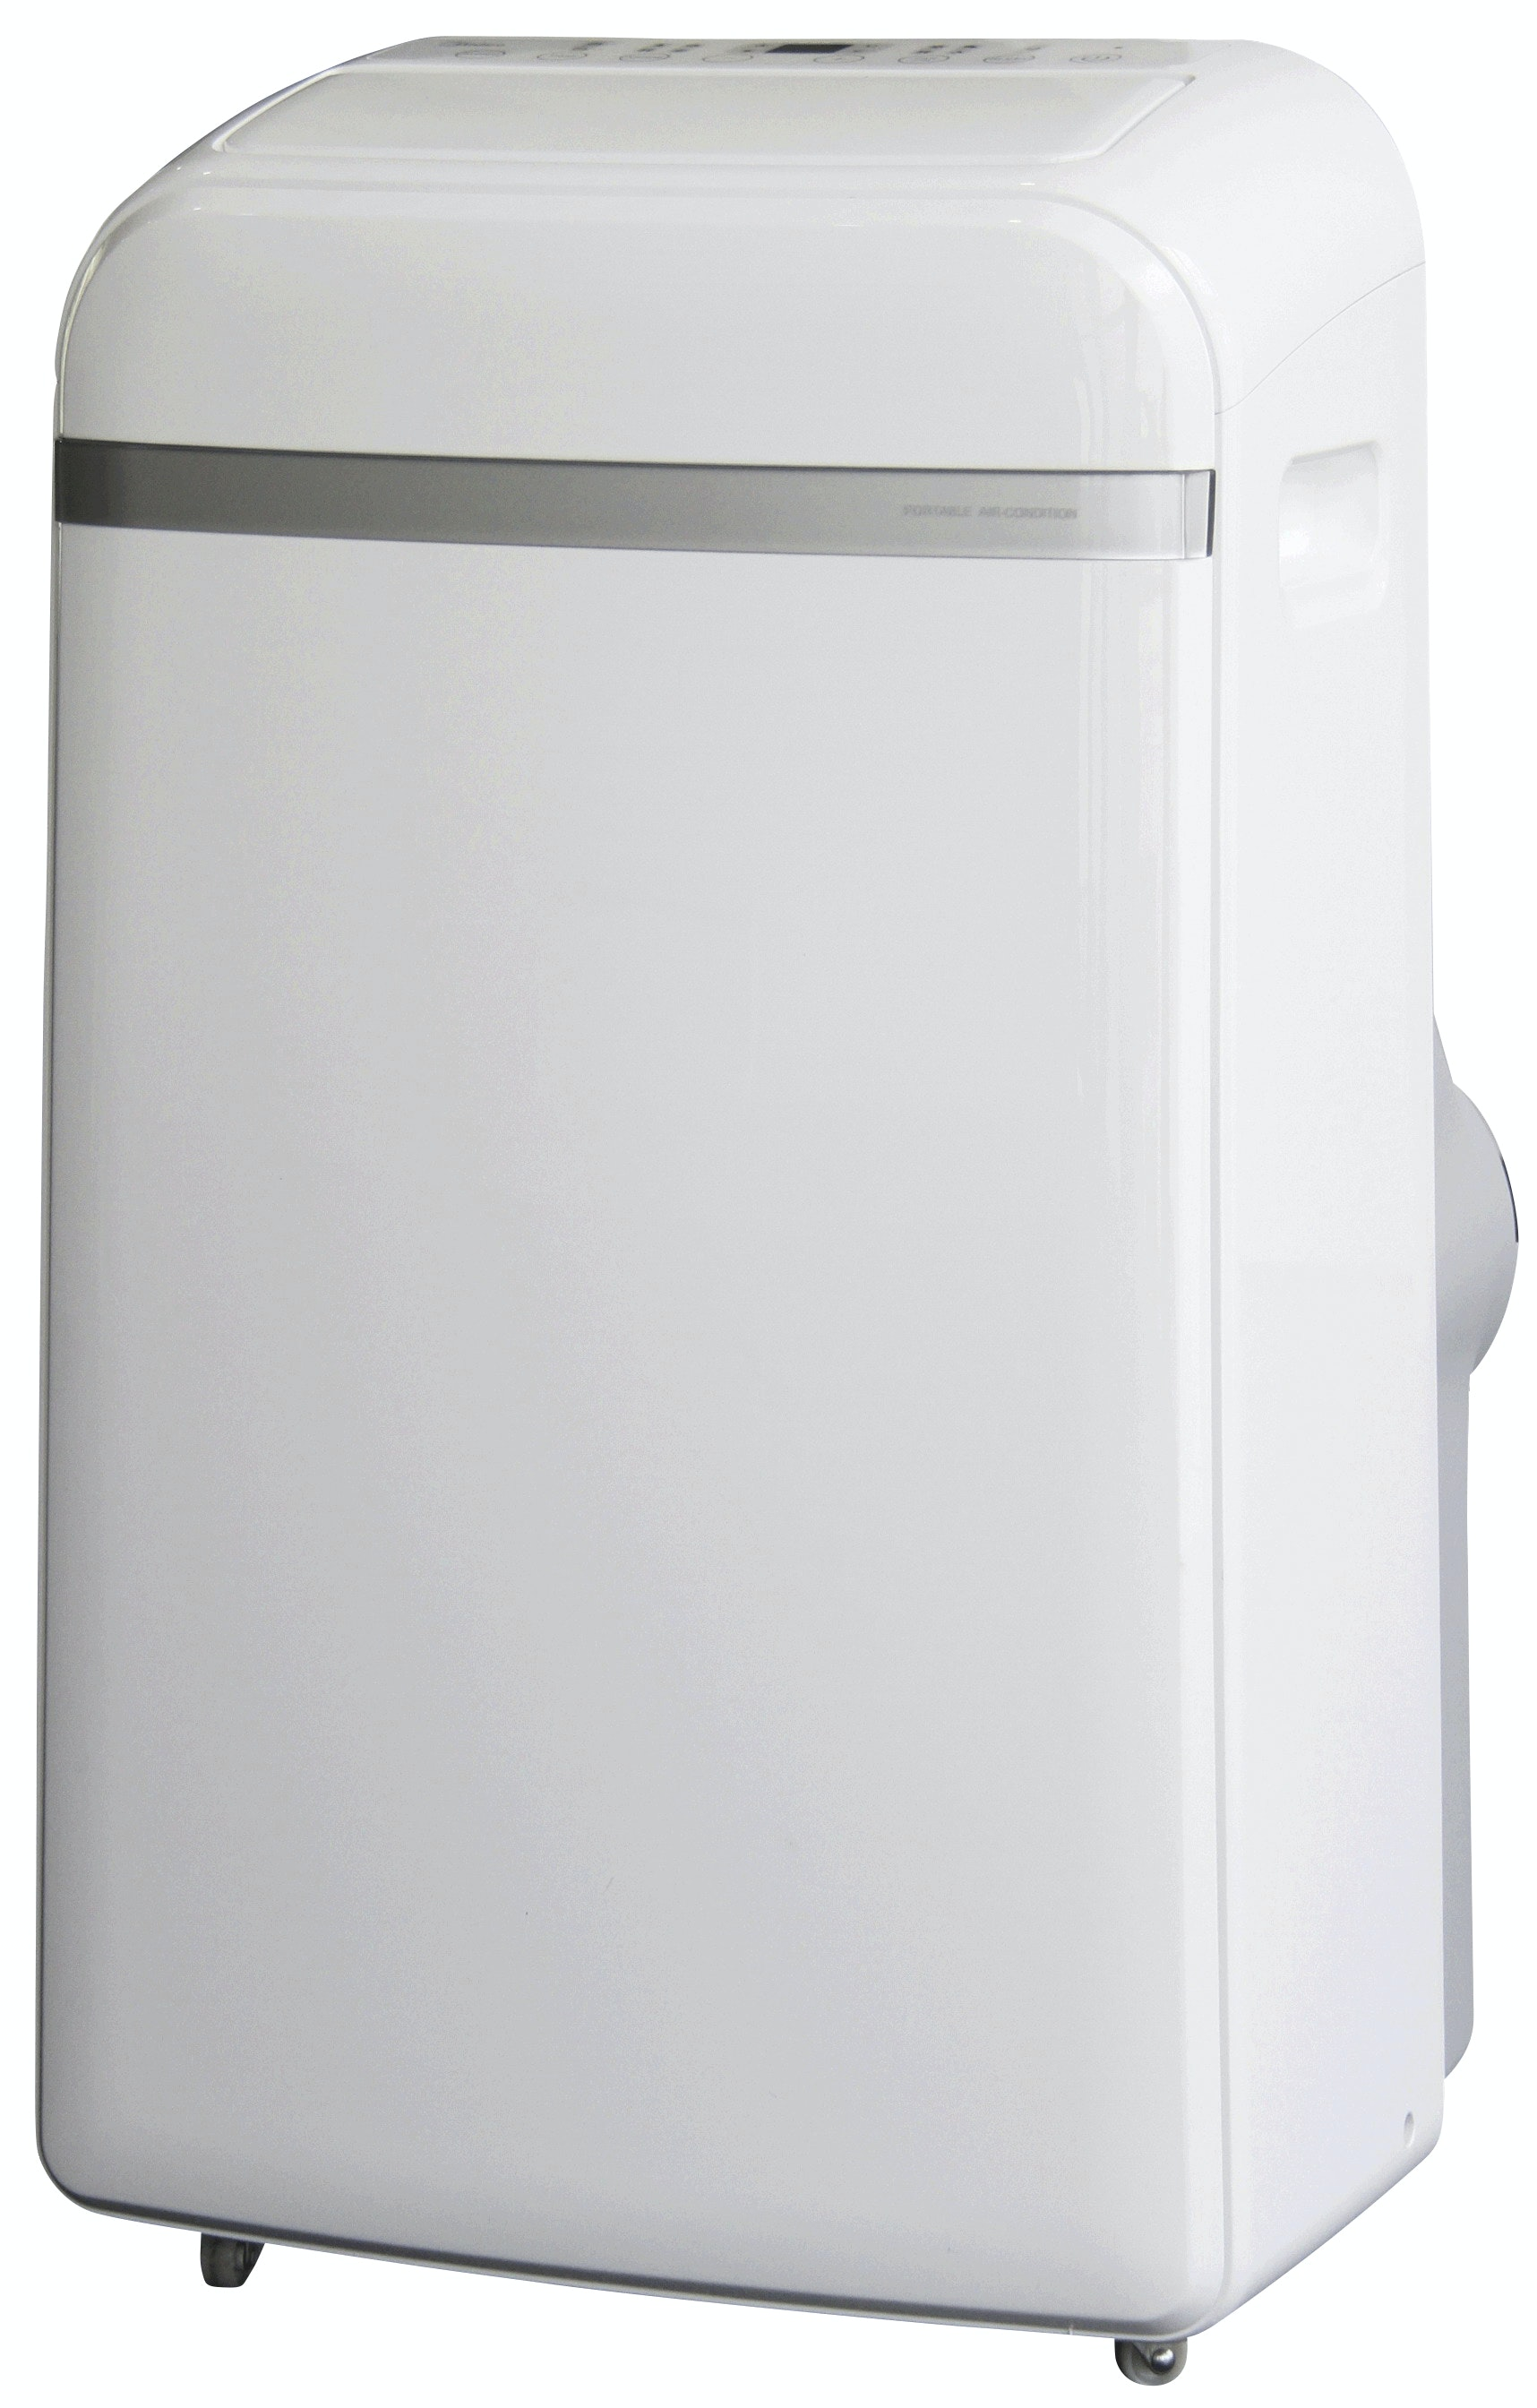 Luftkonditioneringsaggregat Midea Electric Onnline Portabel Ac 3,5Kw